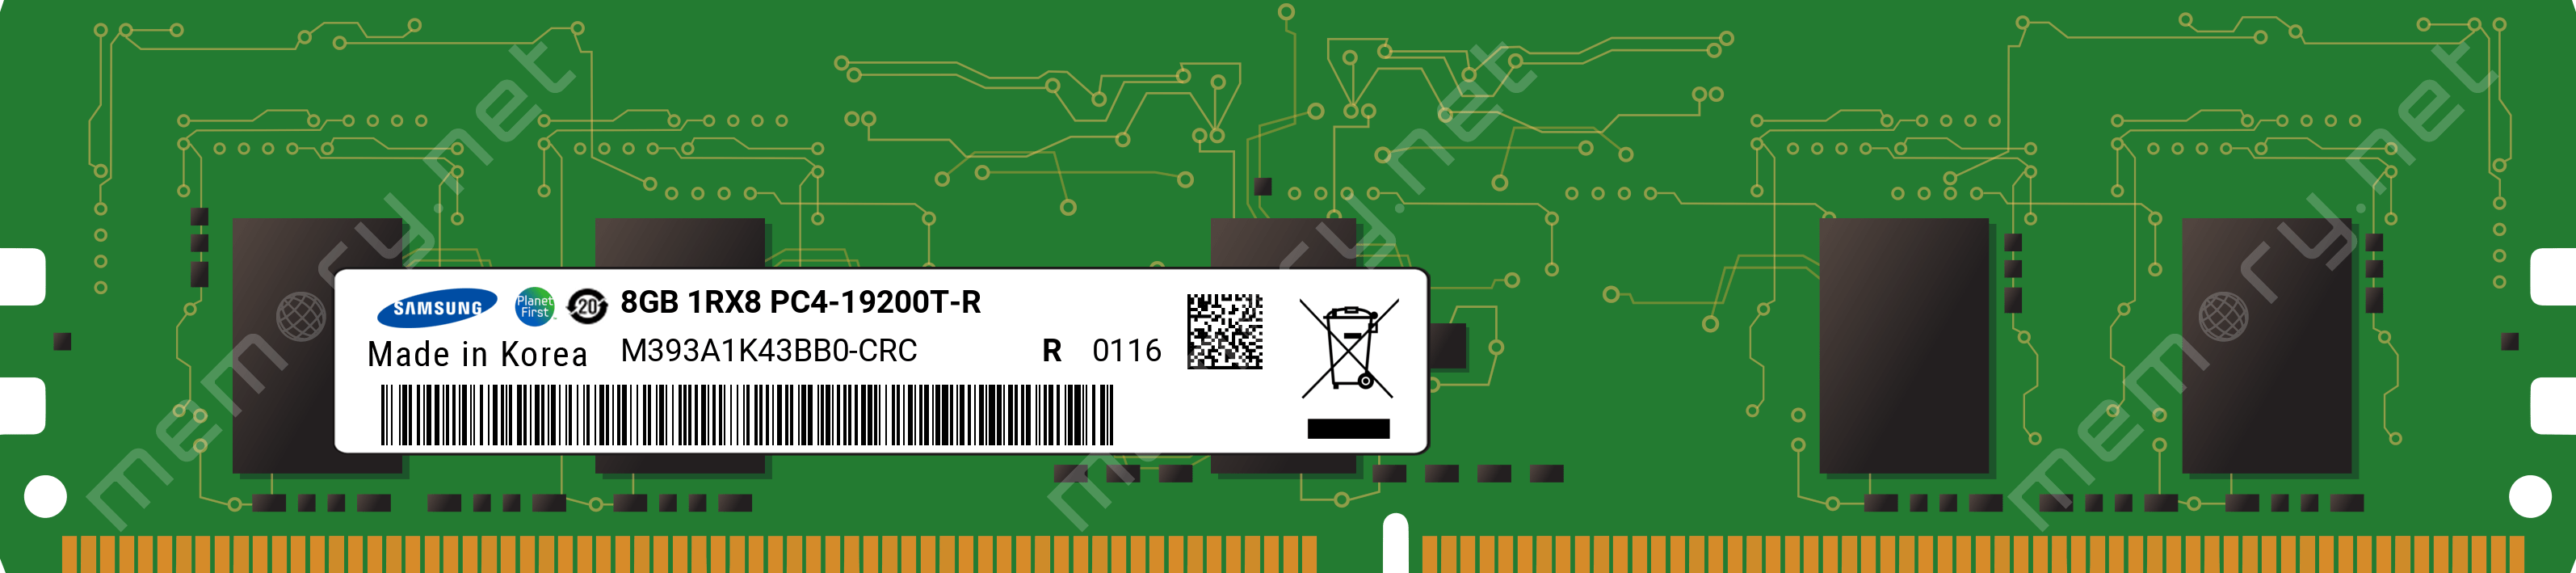 M393A1K43BB0-CRC